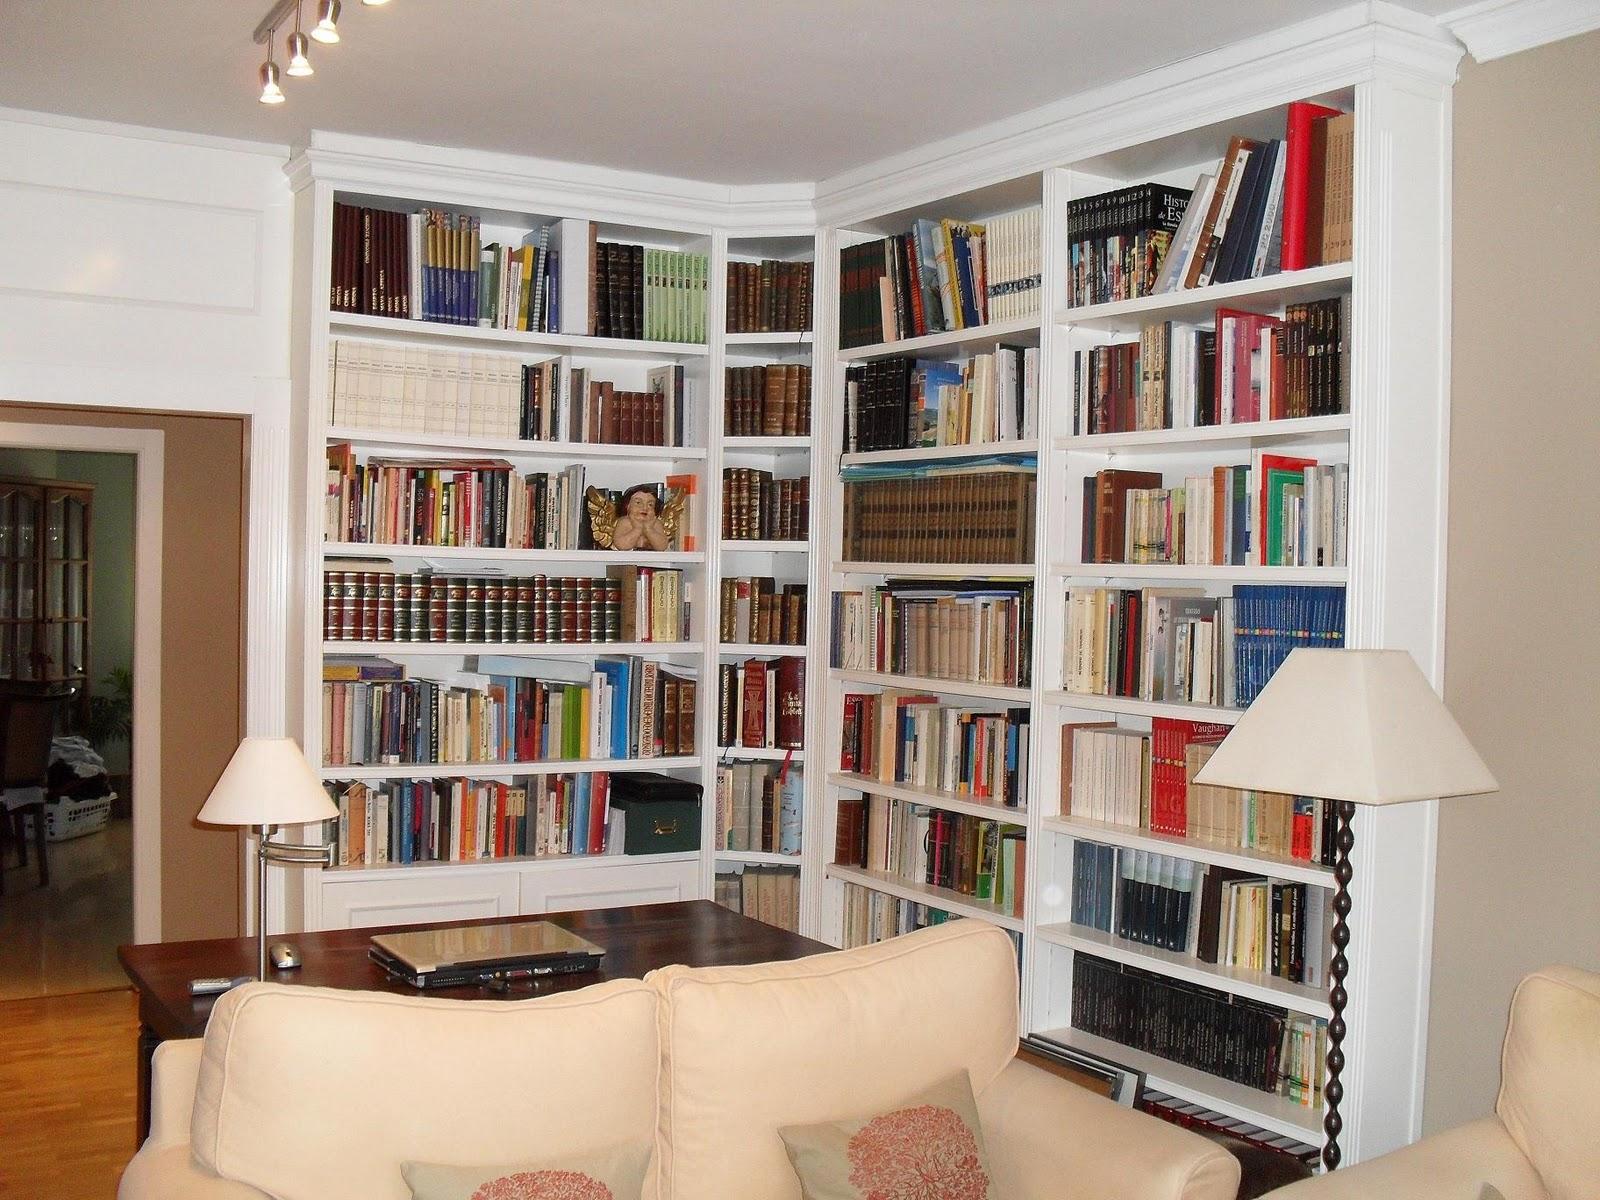 Libreria a medida madrid mueble a medida 617075183 elcarpinterodemadrid - Carpinteria madrid centro ...